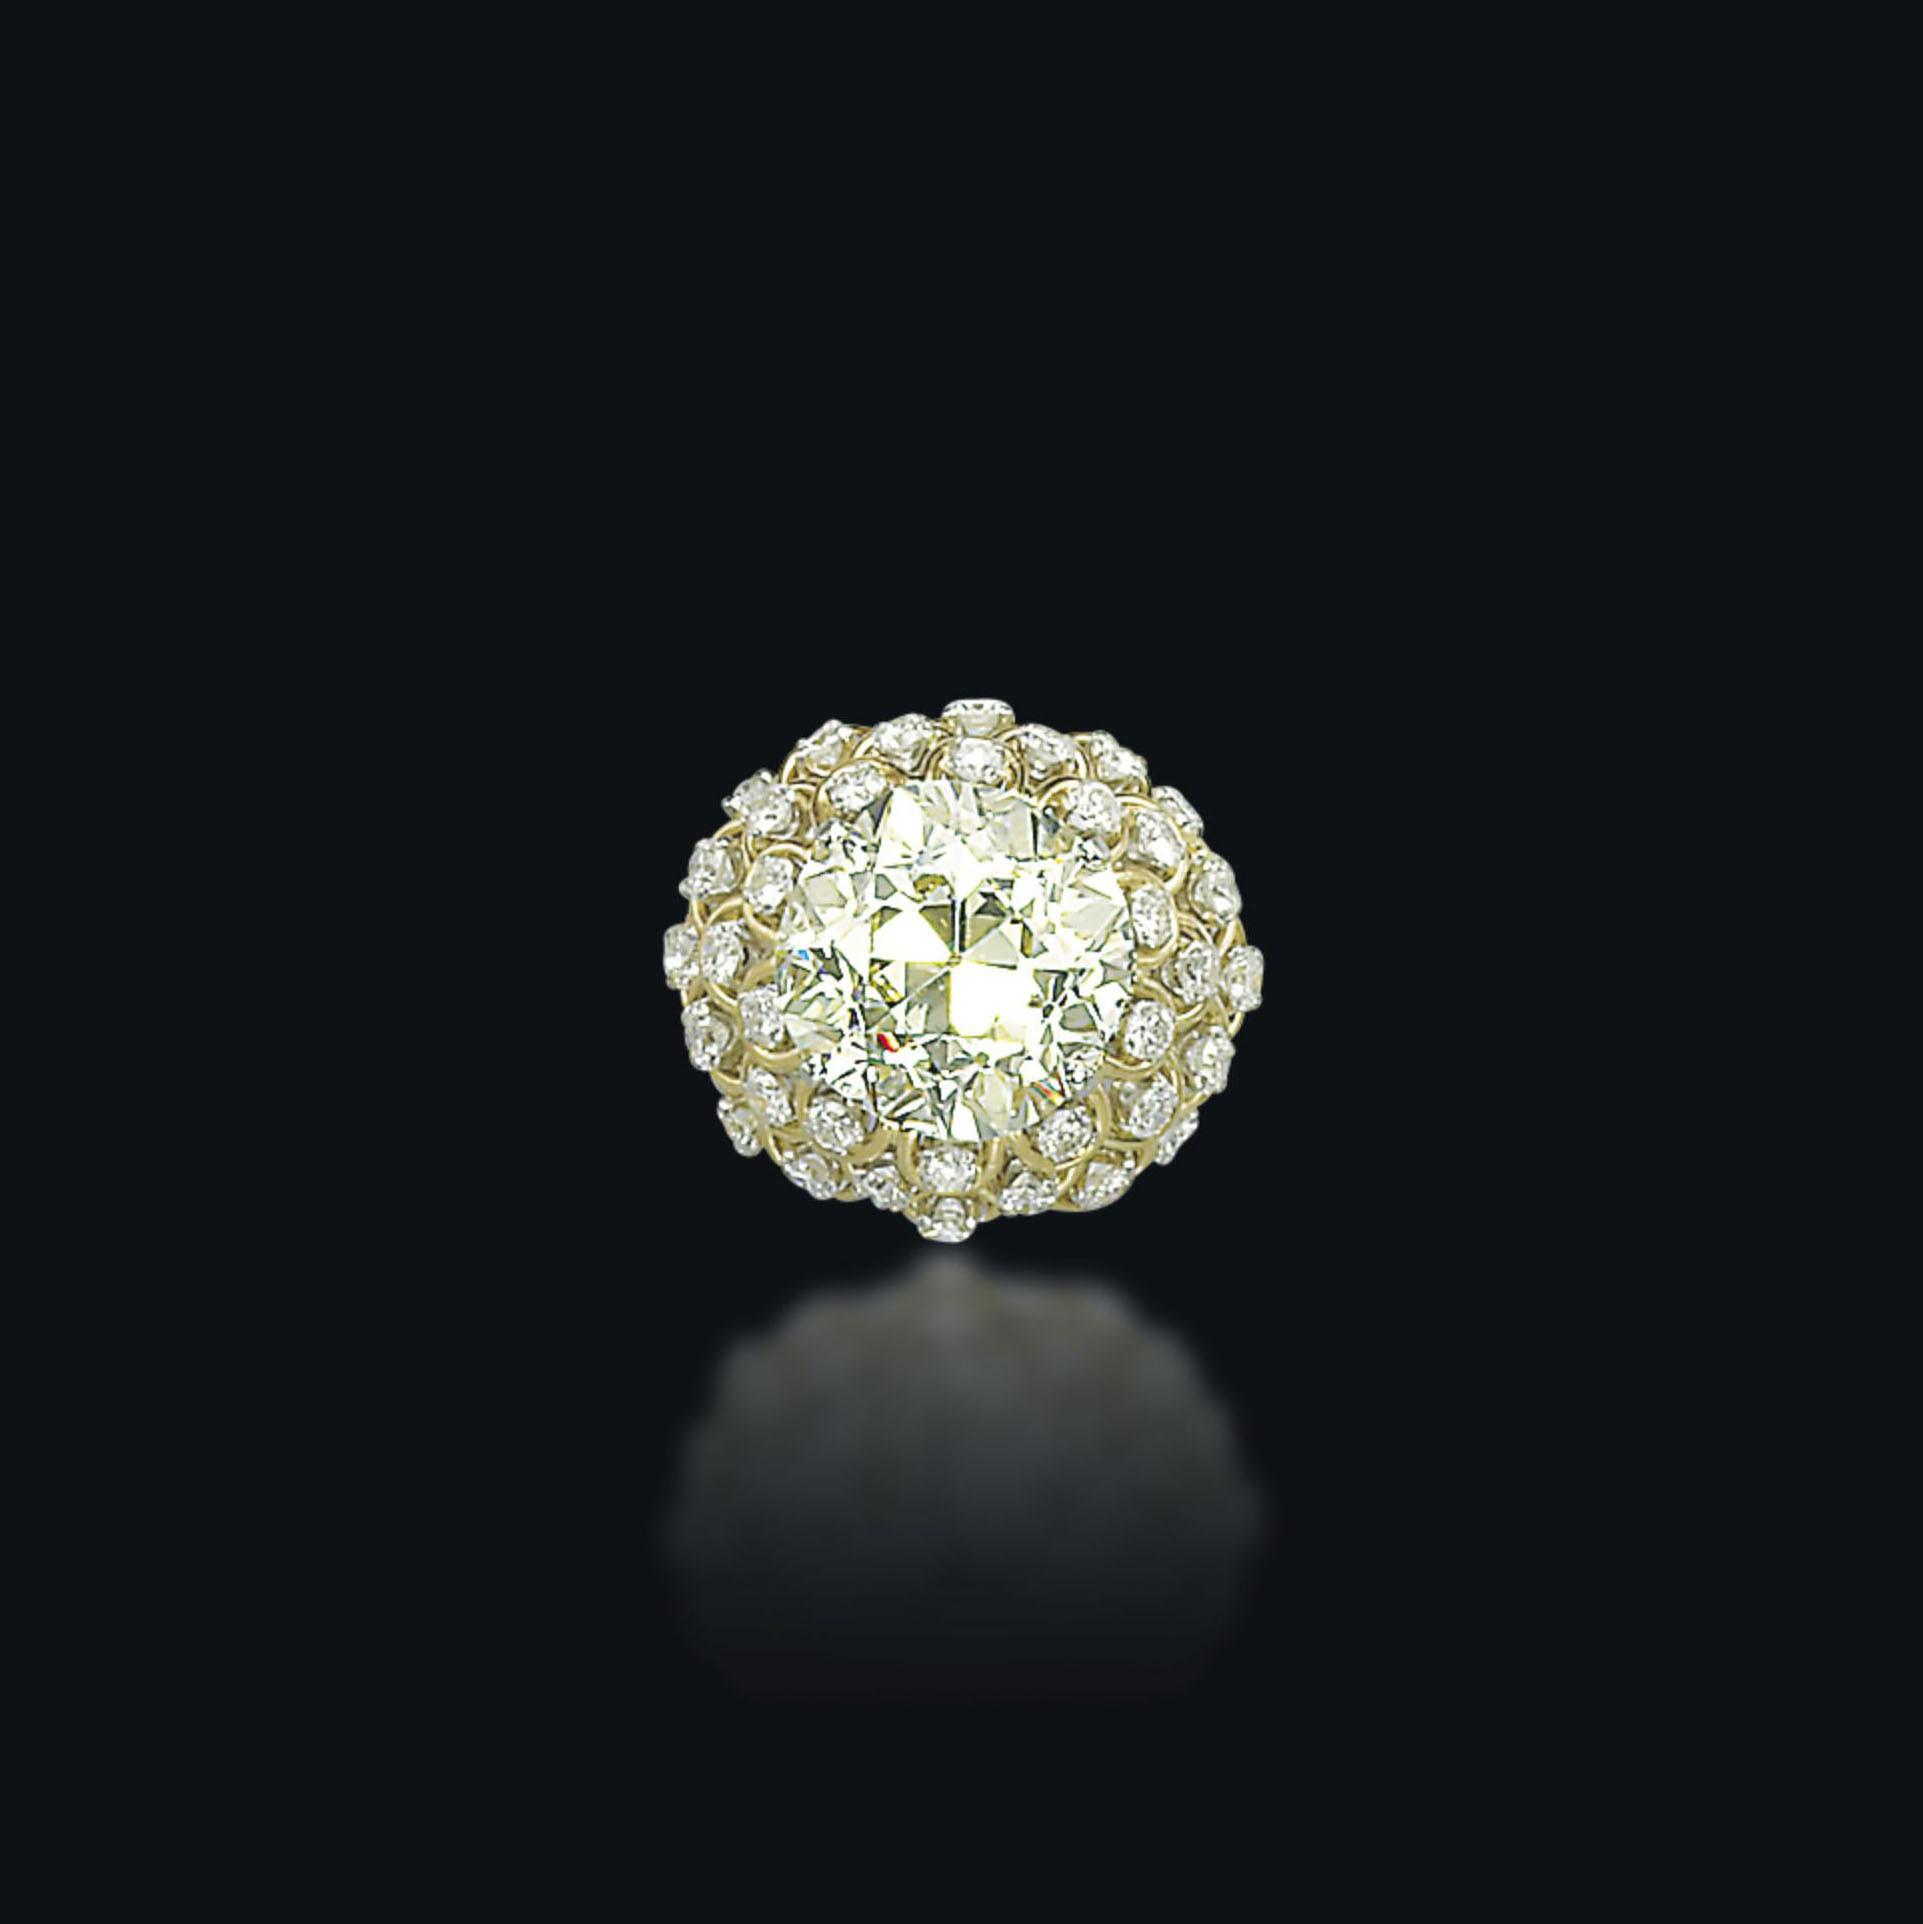 A COLOURED DIAMOND RING, BY DAVID WEBB